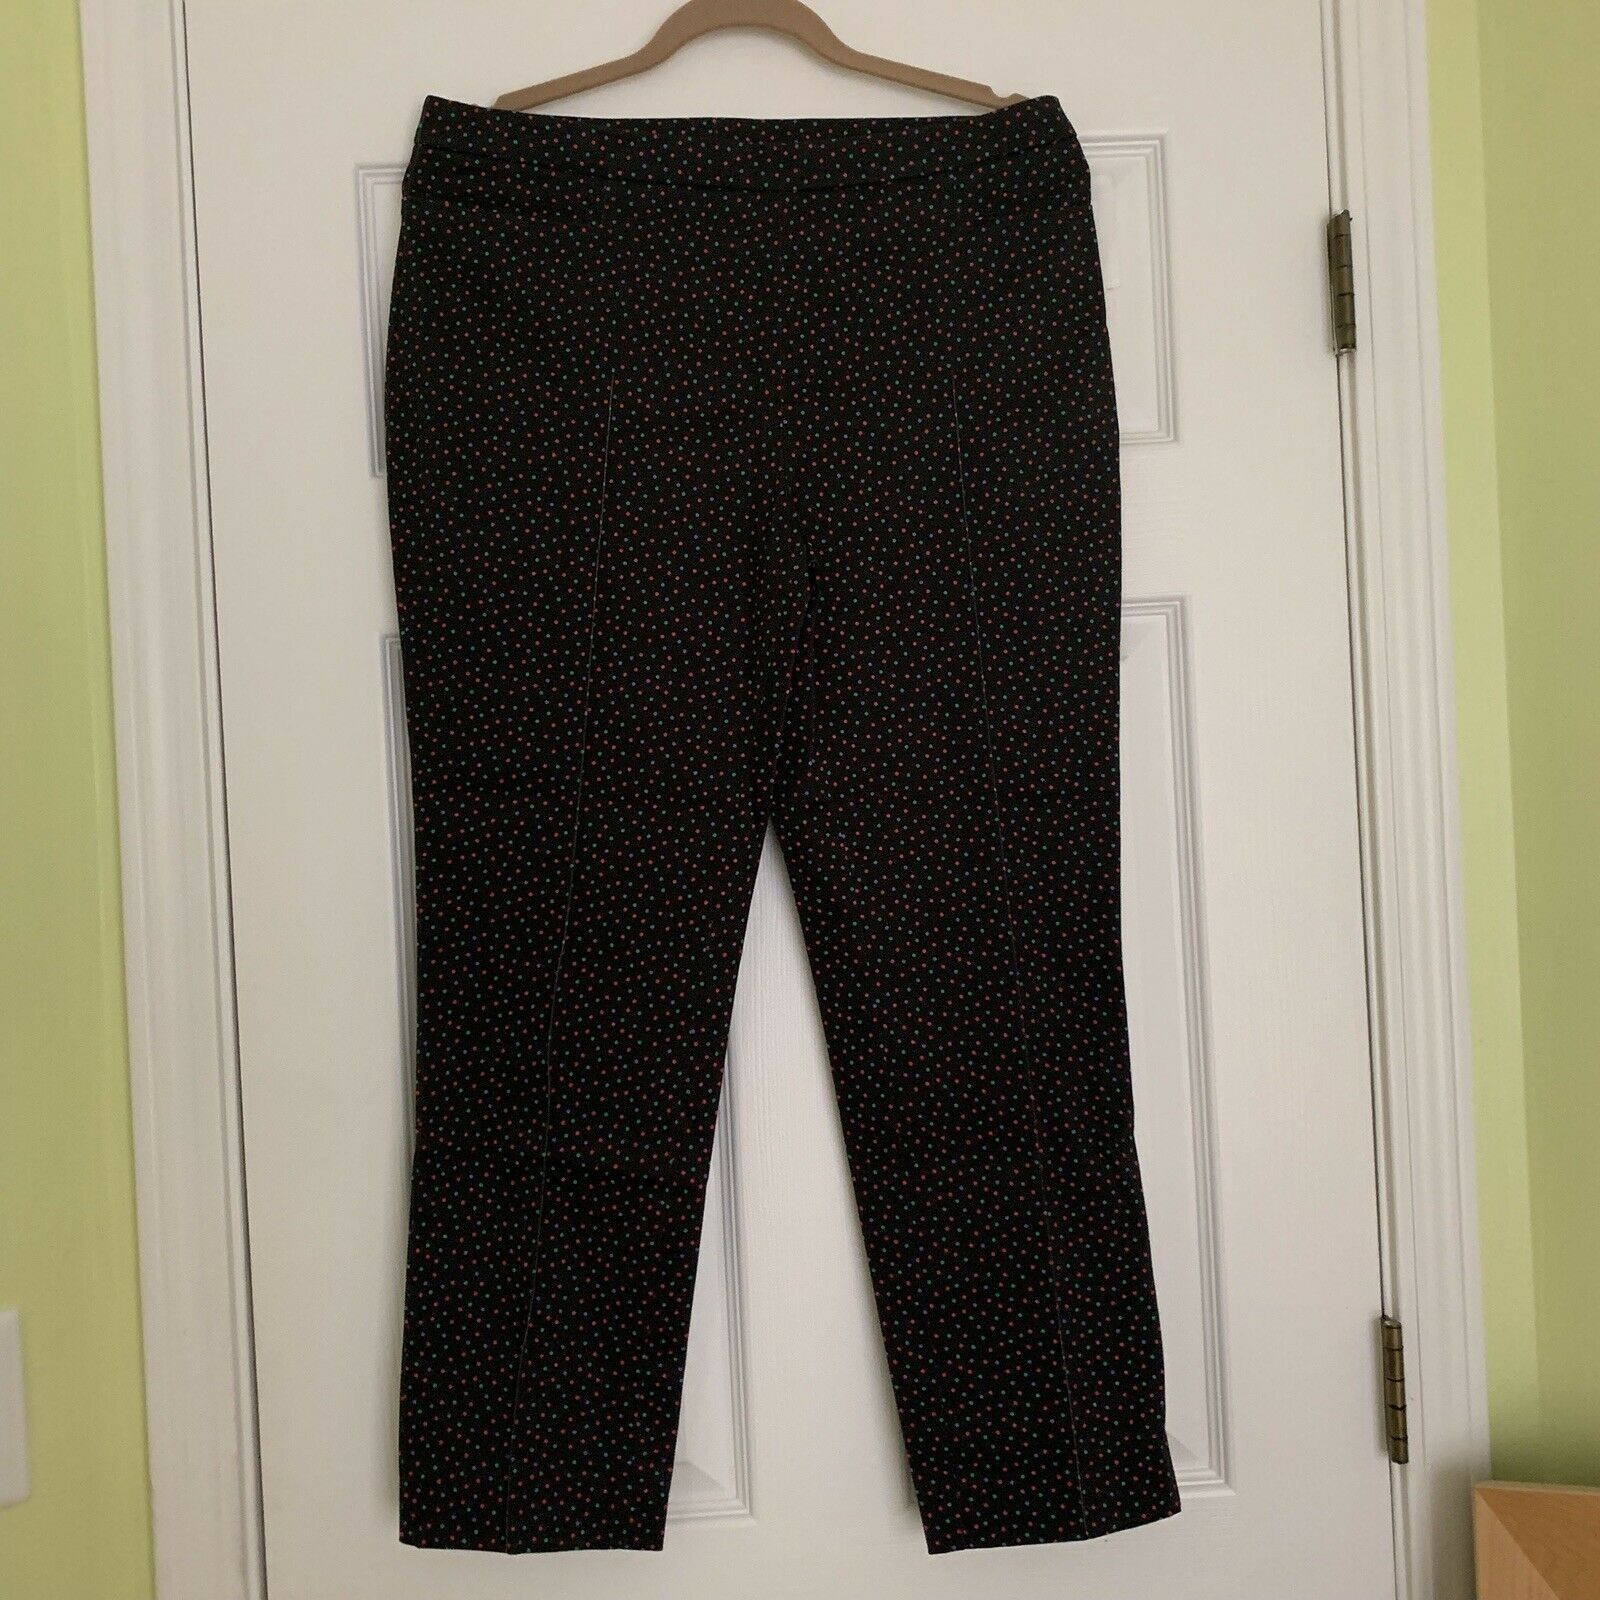 Akris Punto US 10 Casual Straight Leg Polka Dot Pants